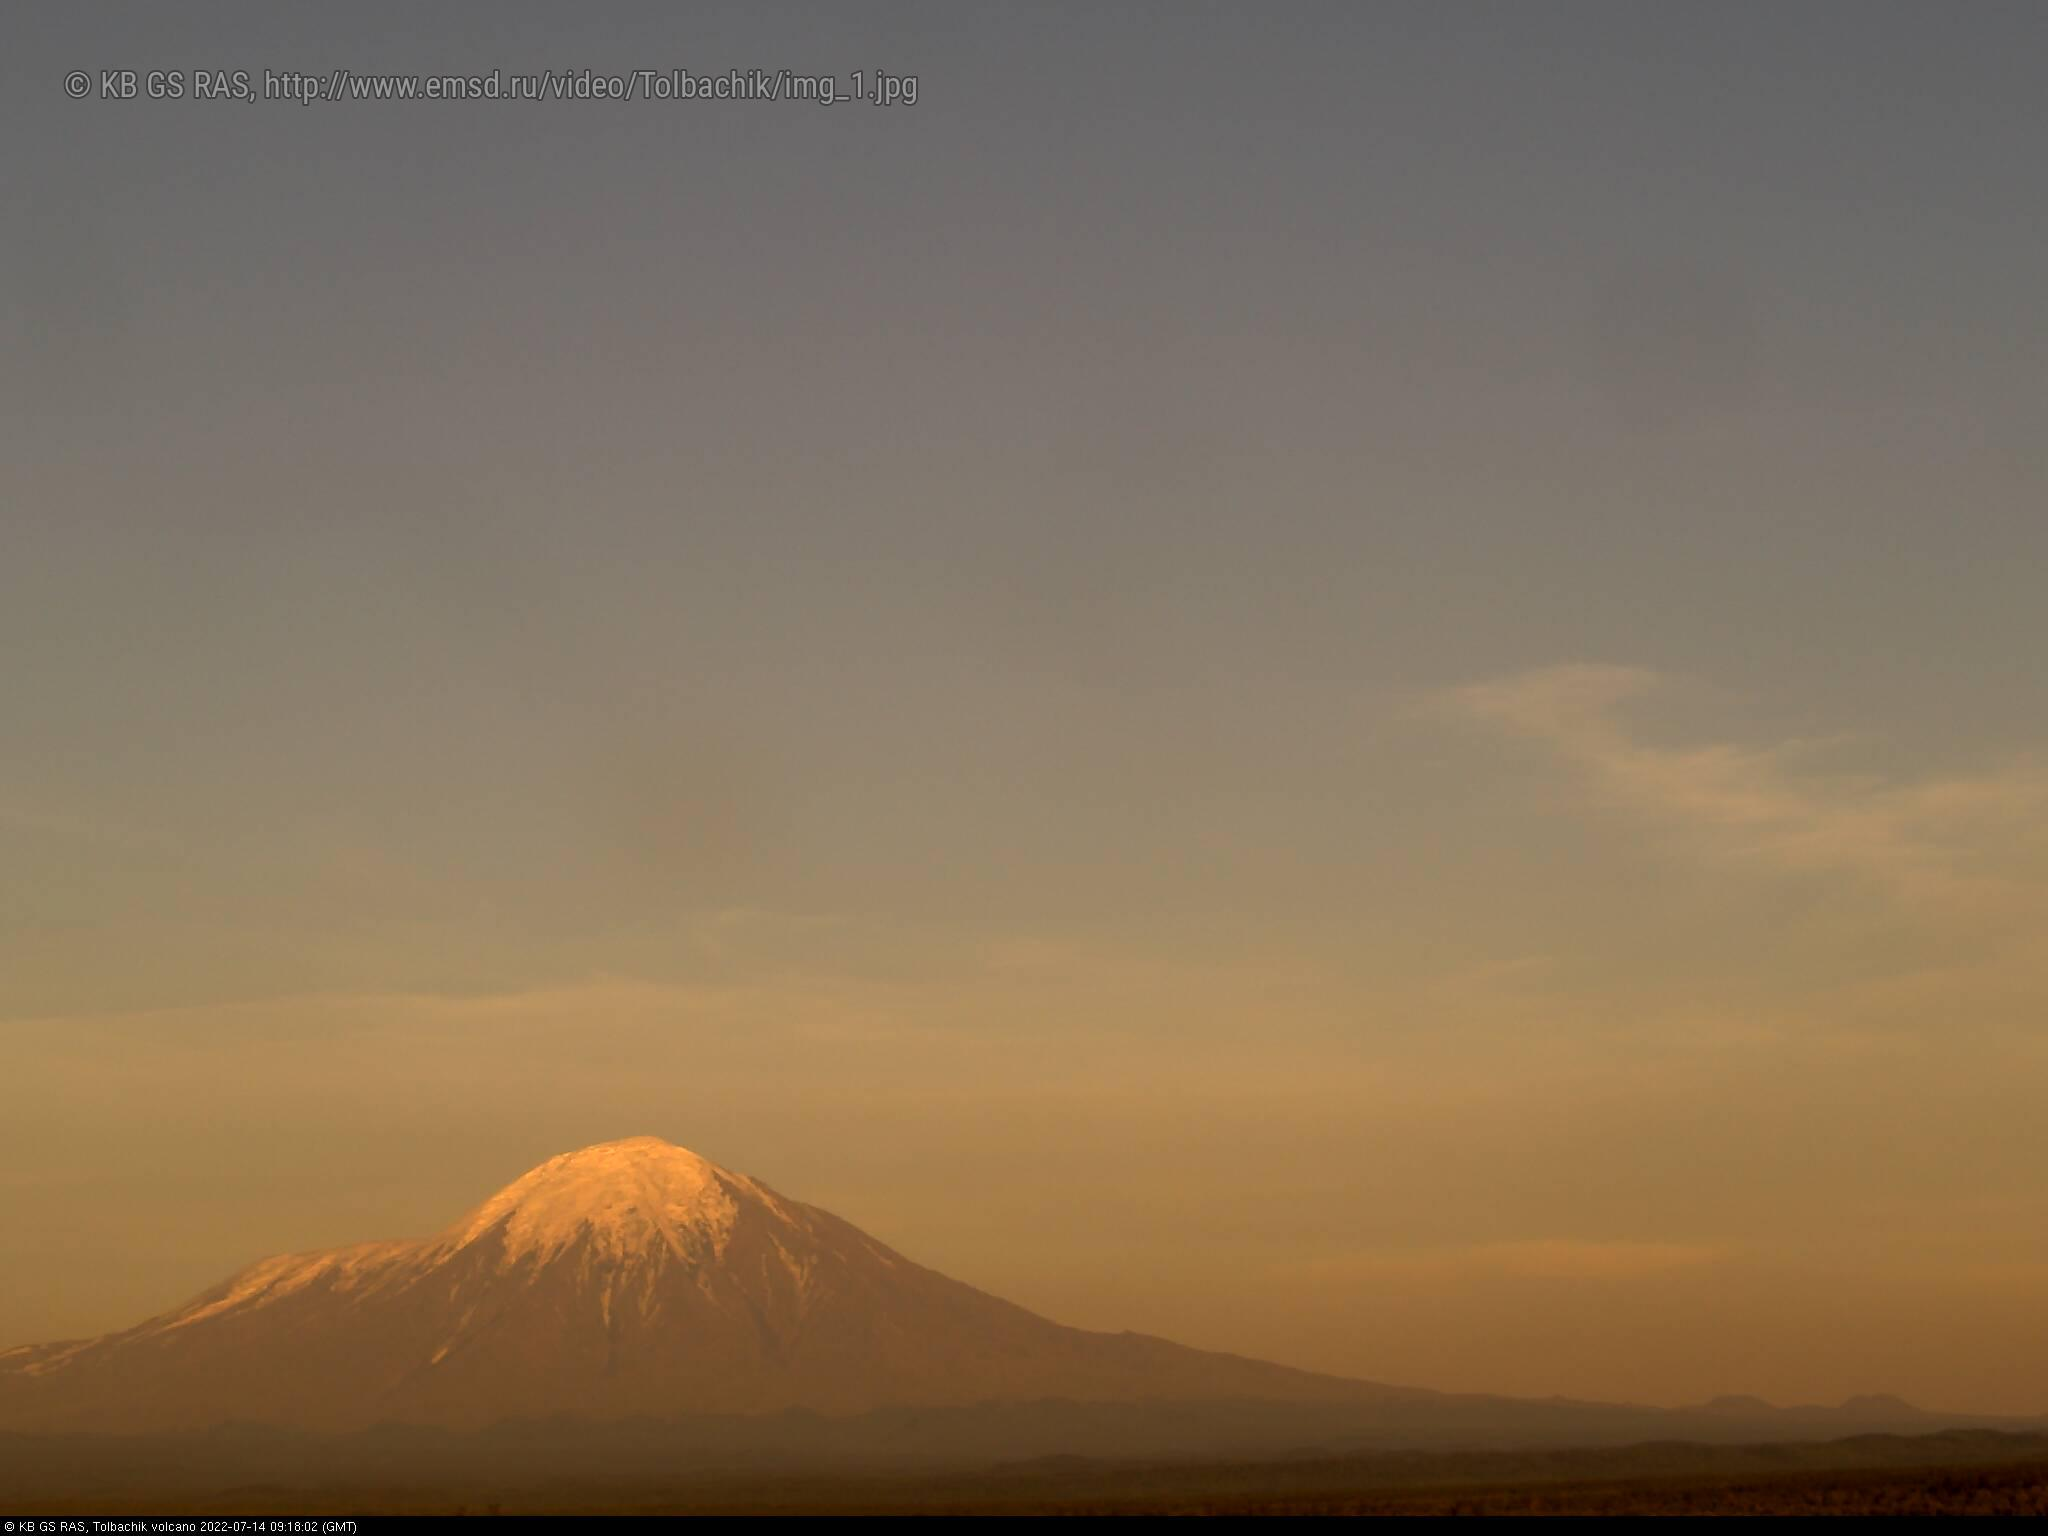 Веб-камера вулкана Плоский Толбачик